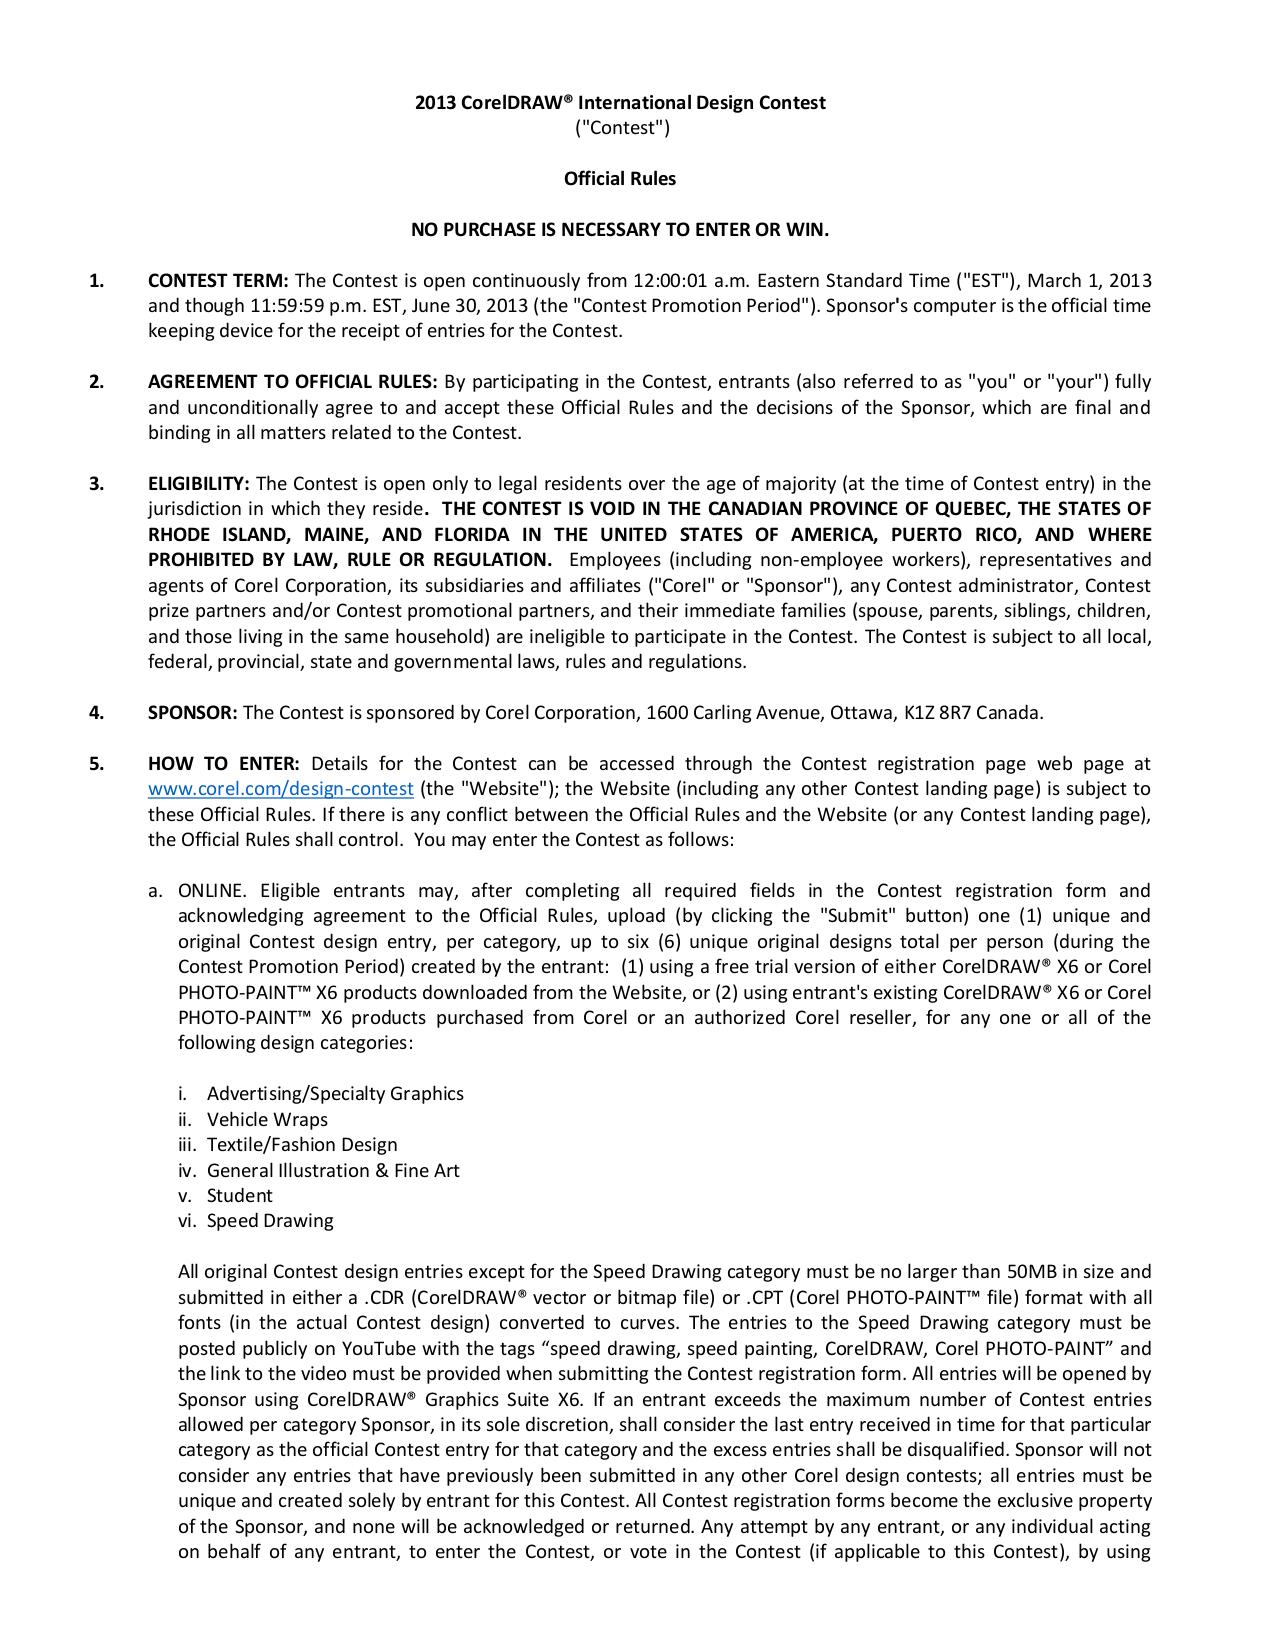 pdf for Wacom Mouse Intuos4 Small manual